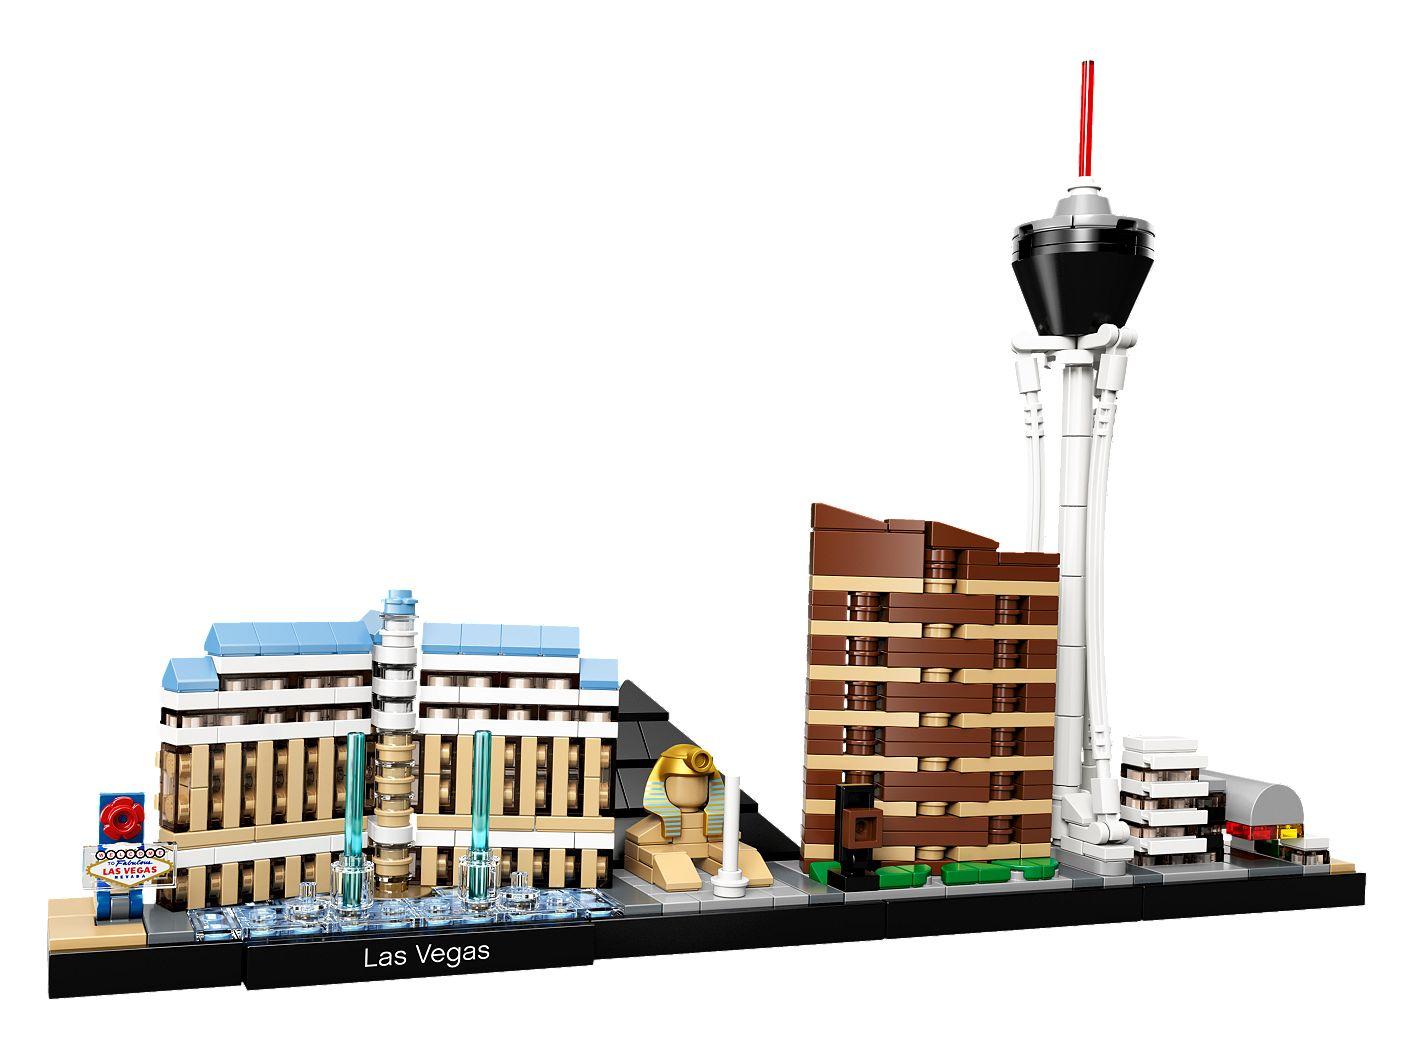 IMAGE(https://sh-s7-live-s.legocdn.com/is/image/LEGO/21047?scl=1.7&op_sharpen=1)